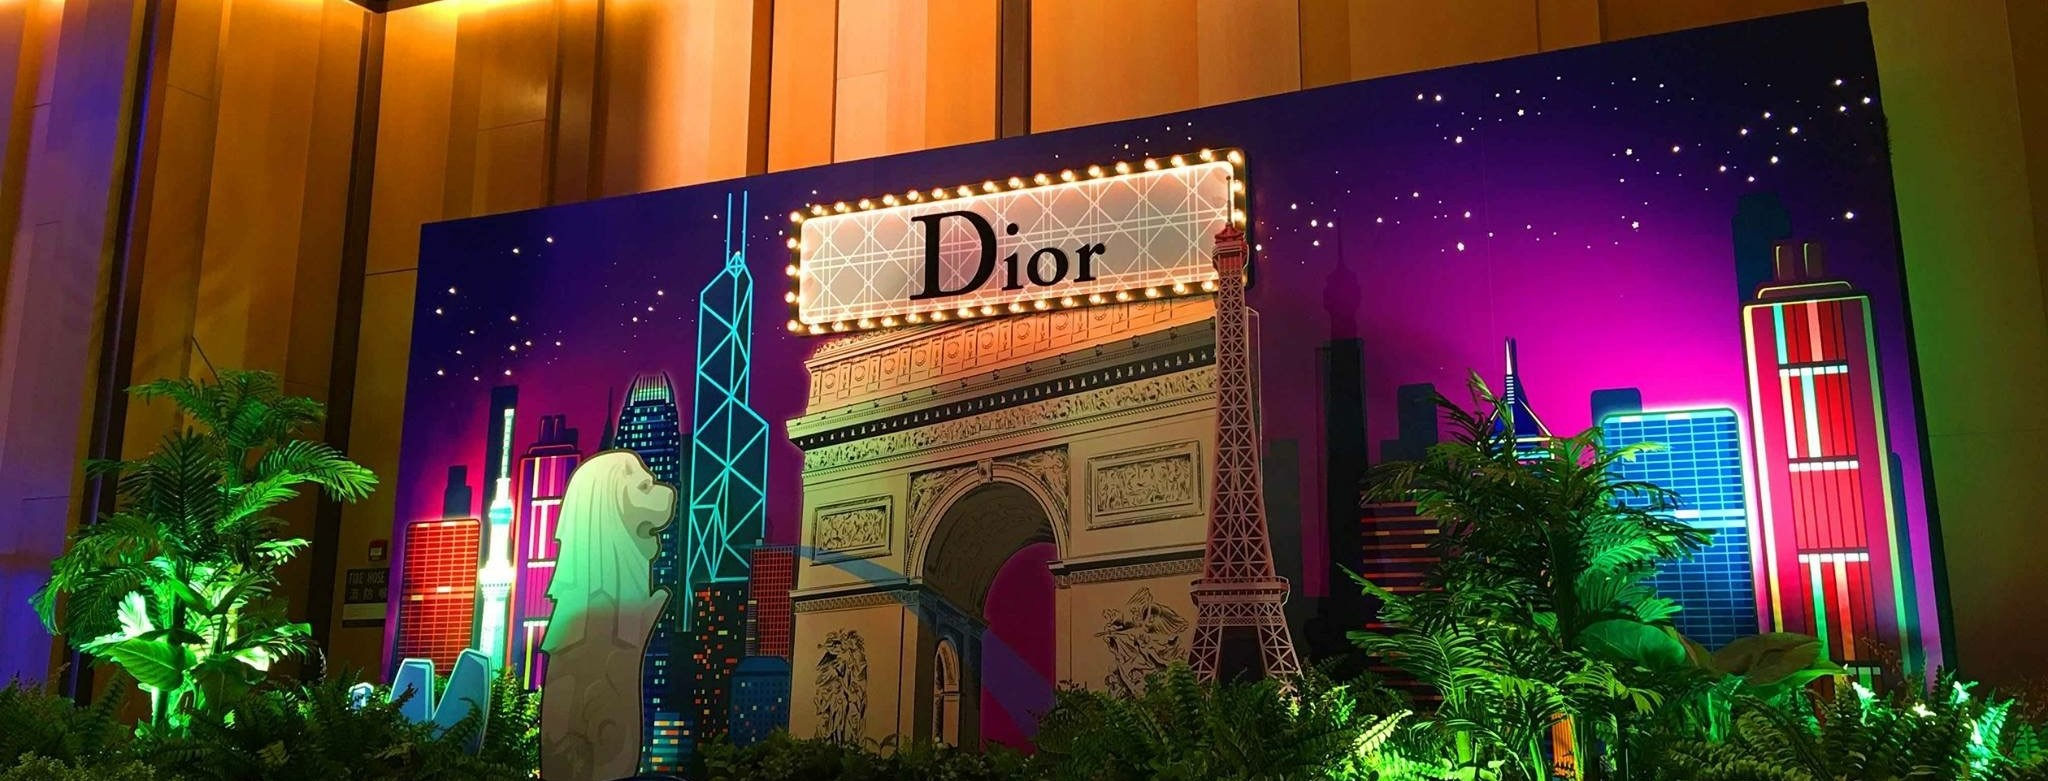 Dior Annual Dinner